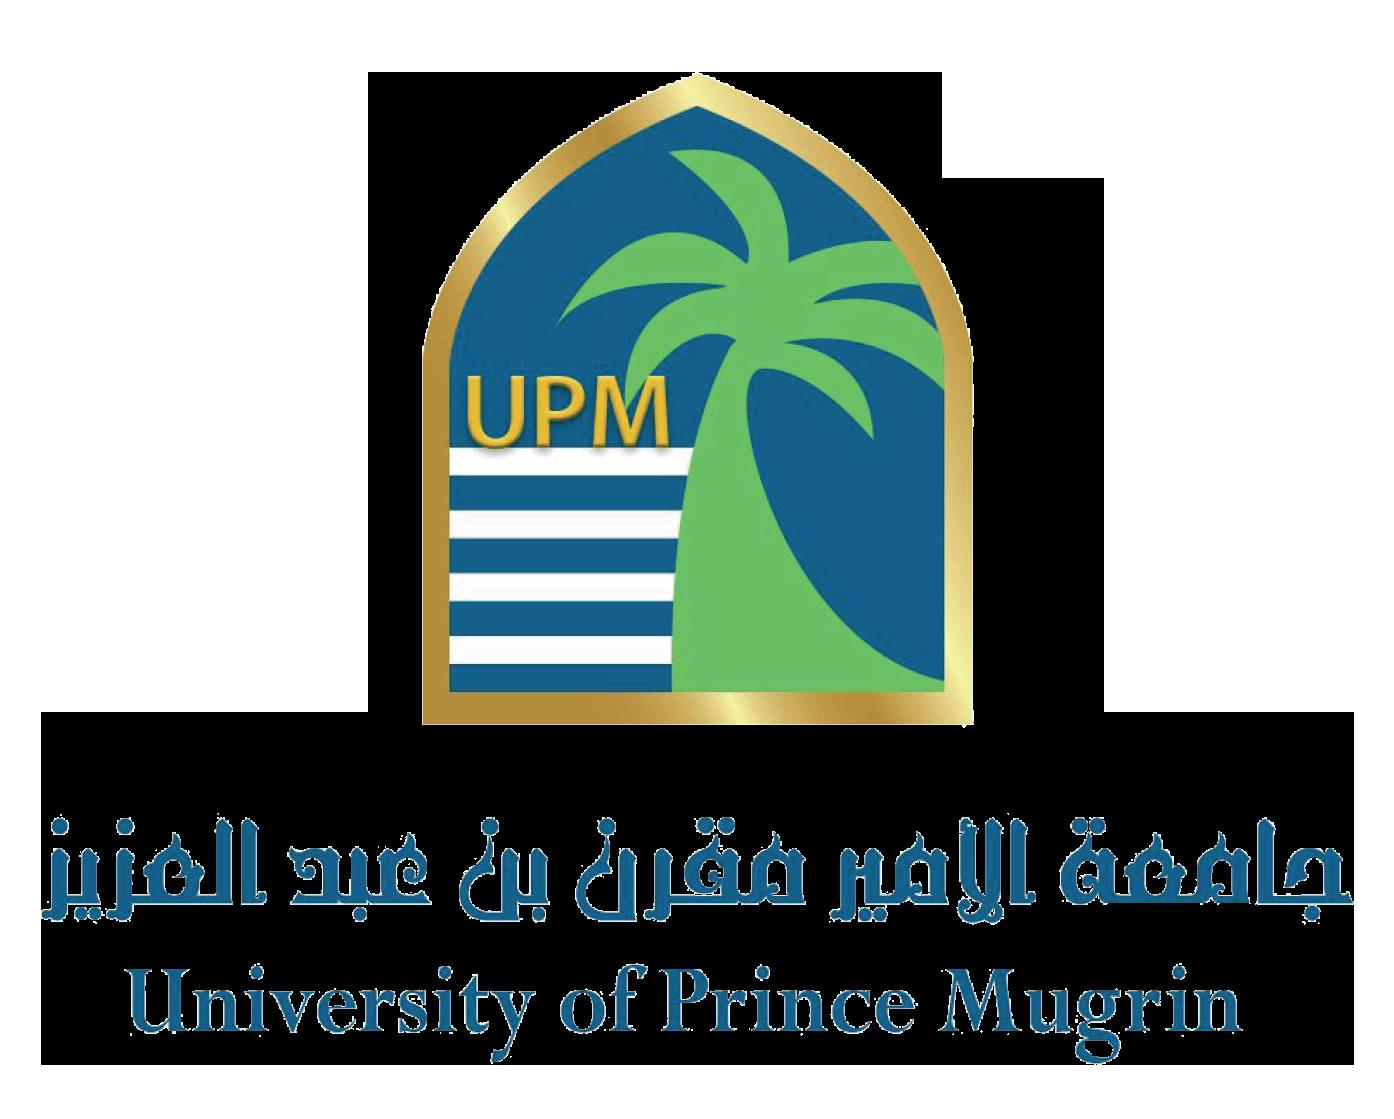 University of Prince Mugrin